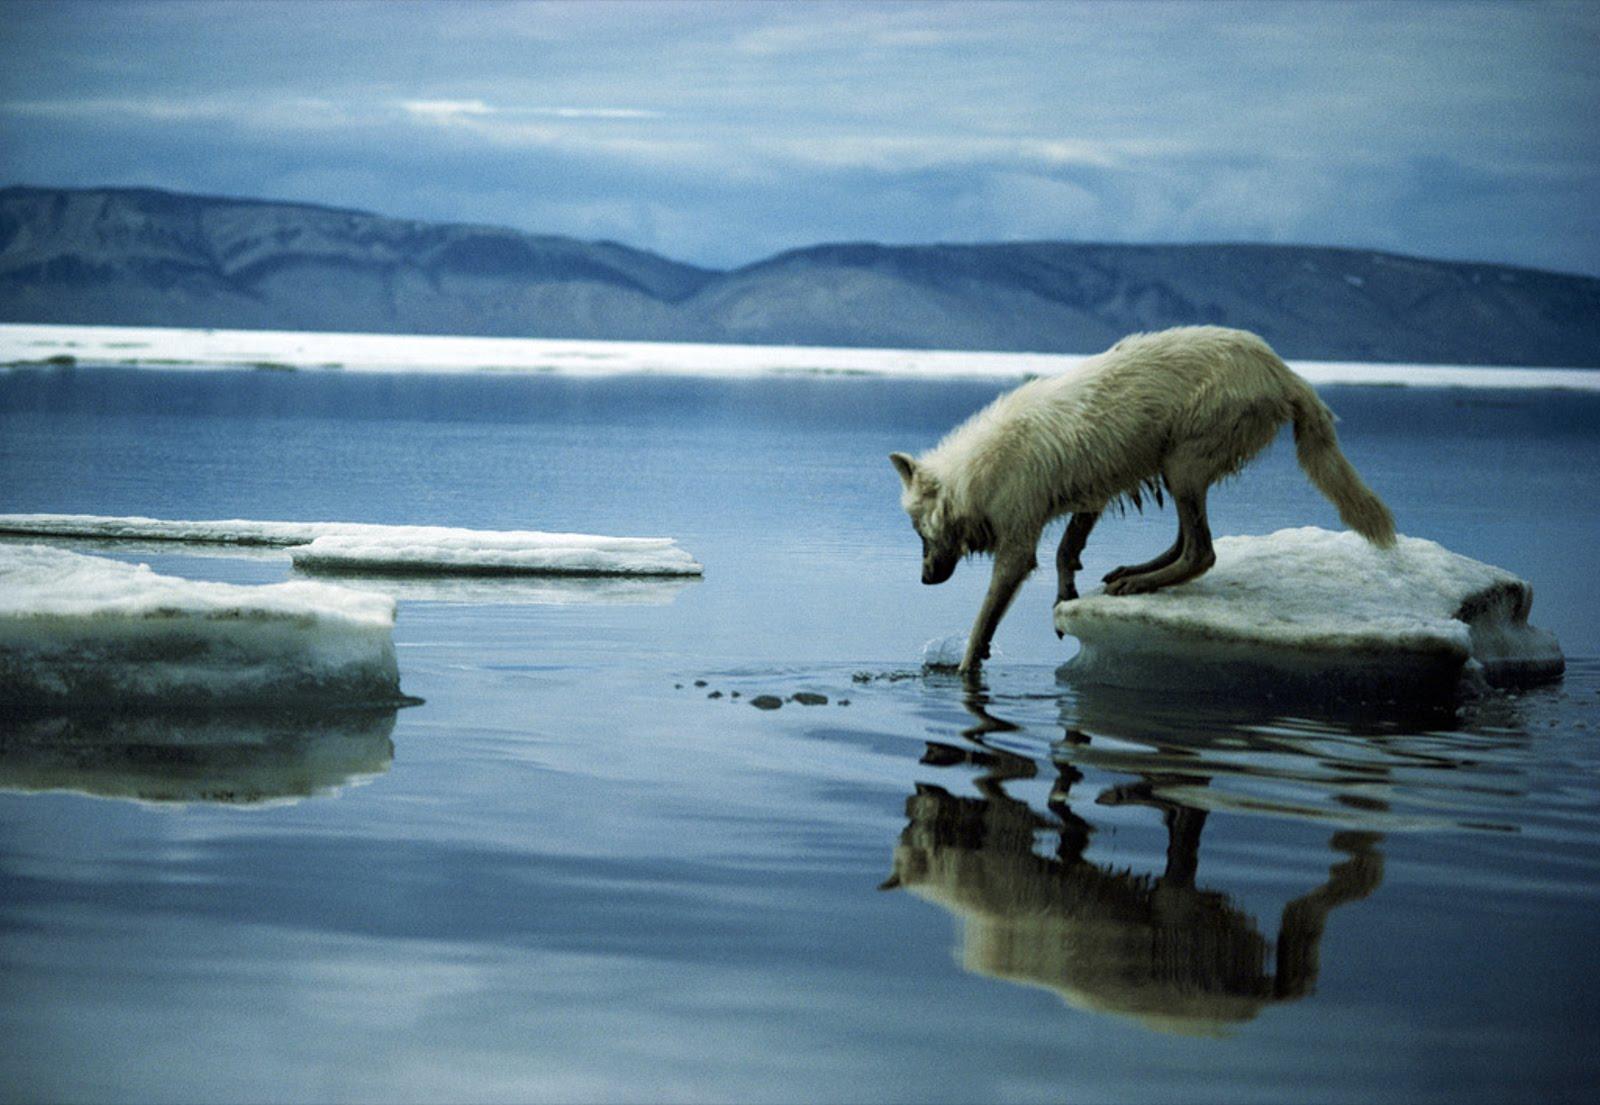 http://3.bp.blogspot.com/-H667t1D_GCA/UFjkKHn0_lI/AAAAAAAAOOw/s4m0FRQx8Bo/s1600/national_geographic_special_series_hq_desktop_wallpapers_masaustu_arkaplan_resimleri_arctic_wolf-other.jpg